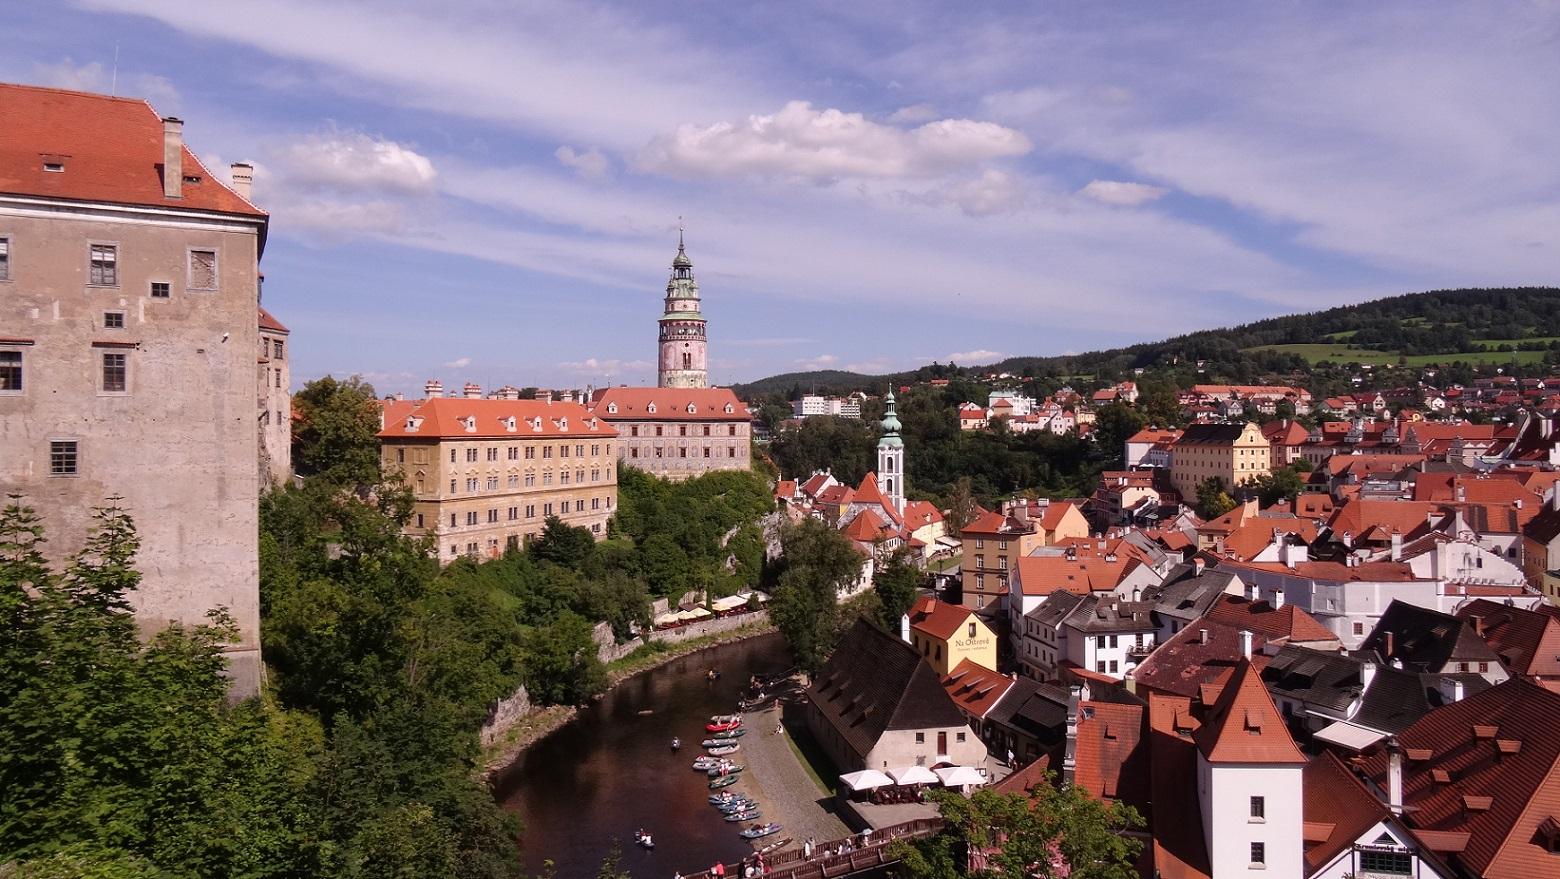 Cesky Krumlov, petite Prague médiévale